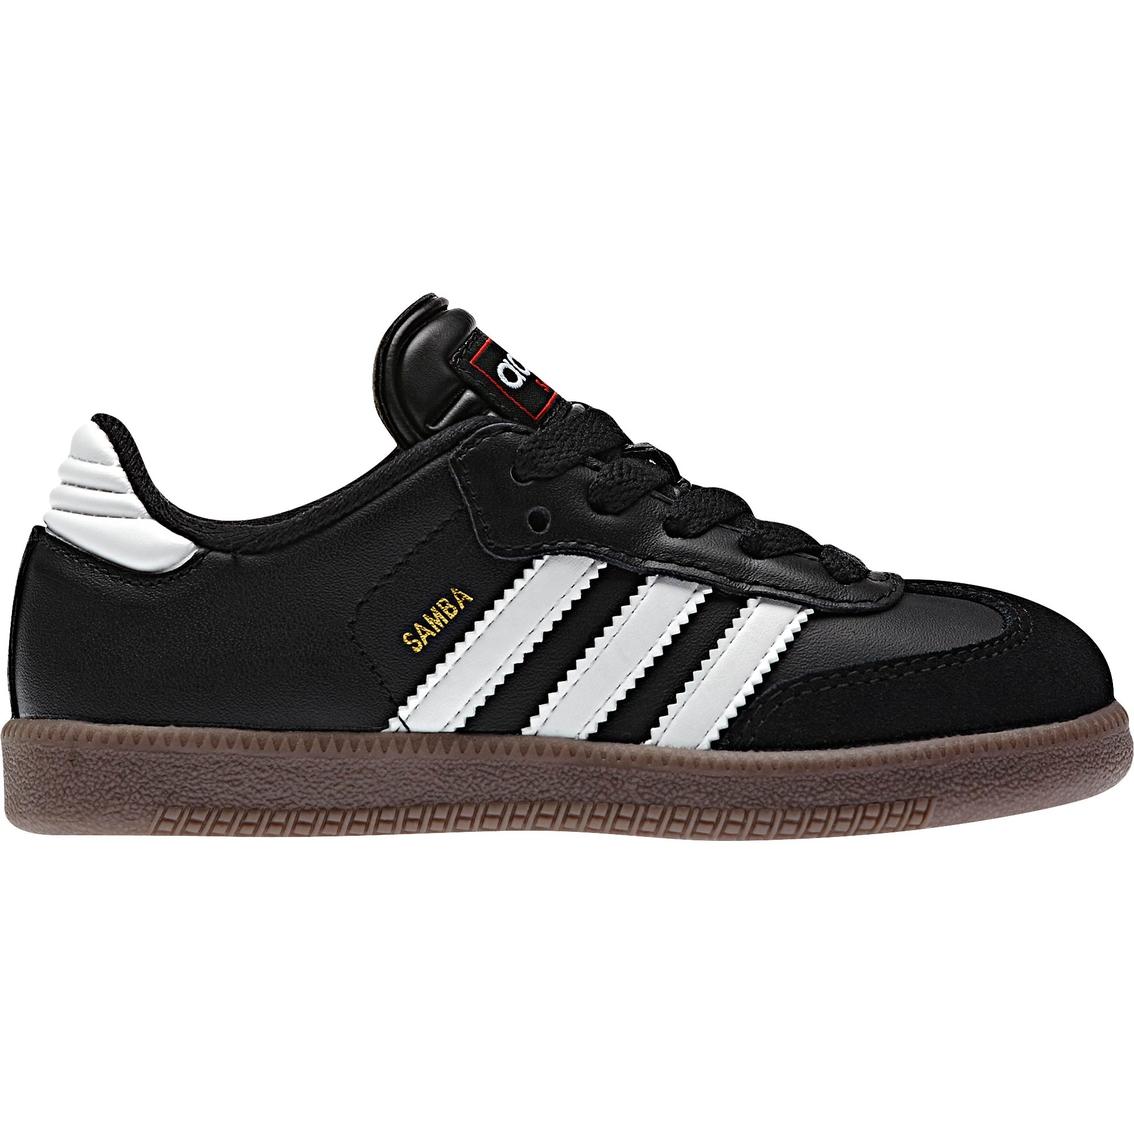 Adidas Samba Classic Youth Indoor